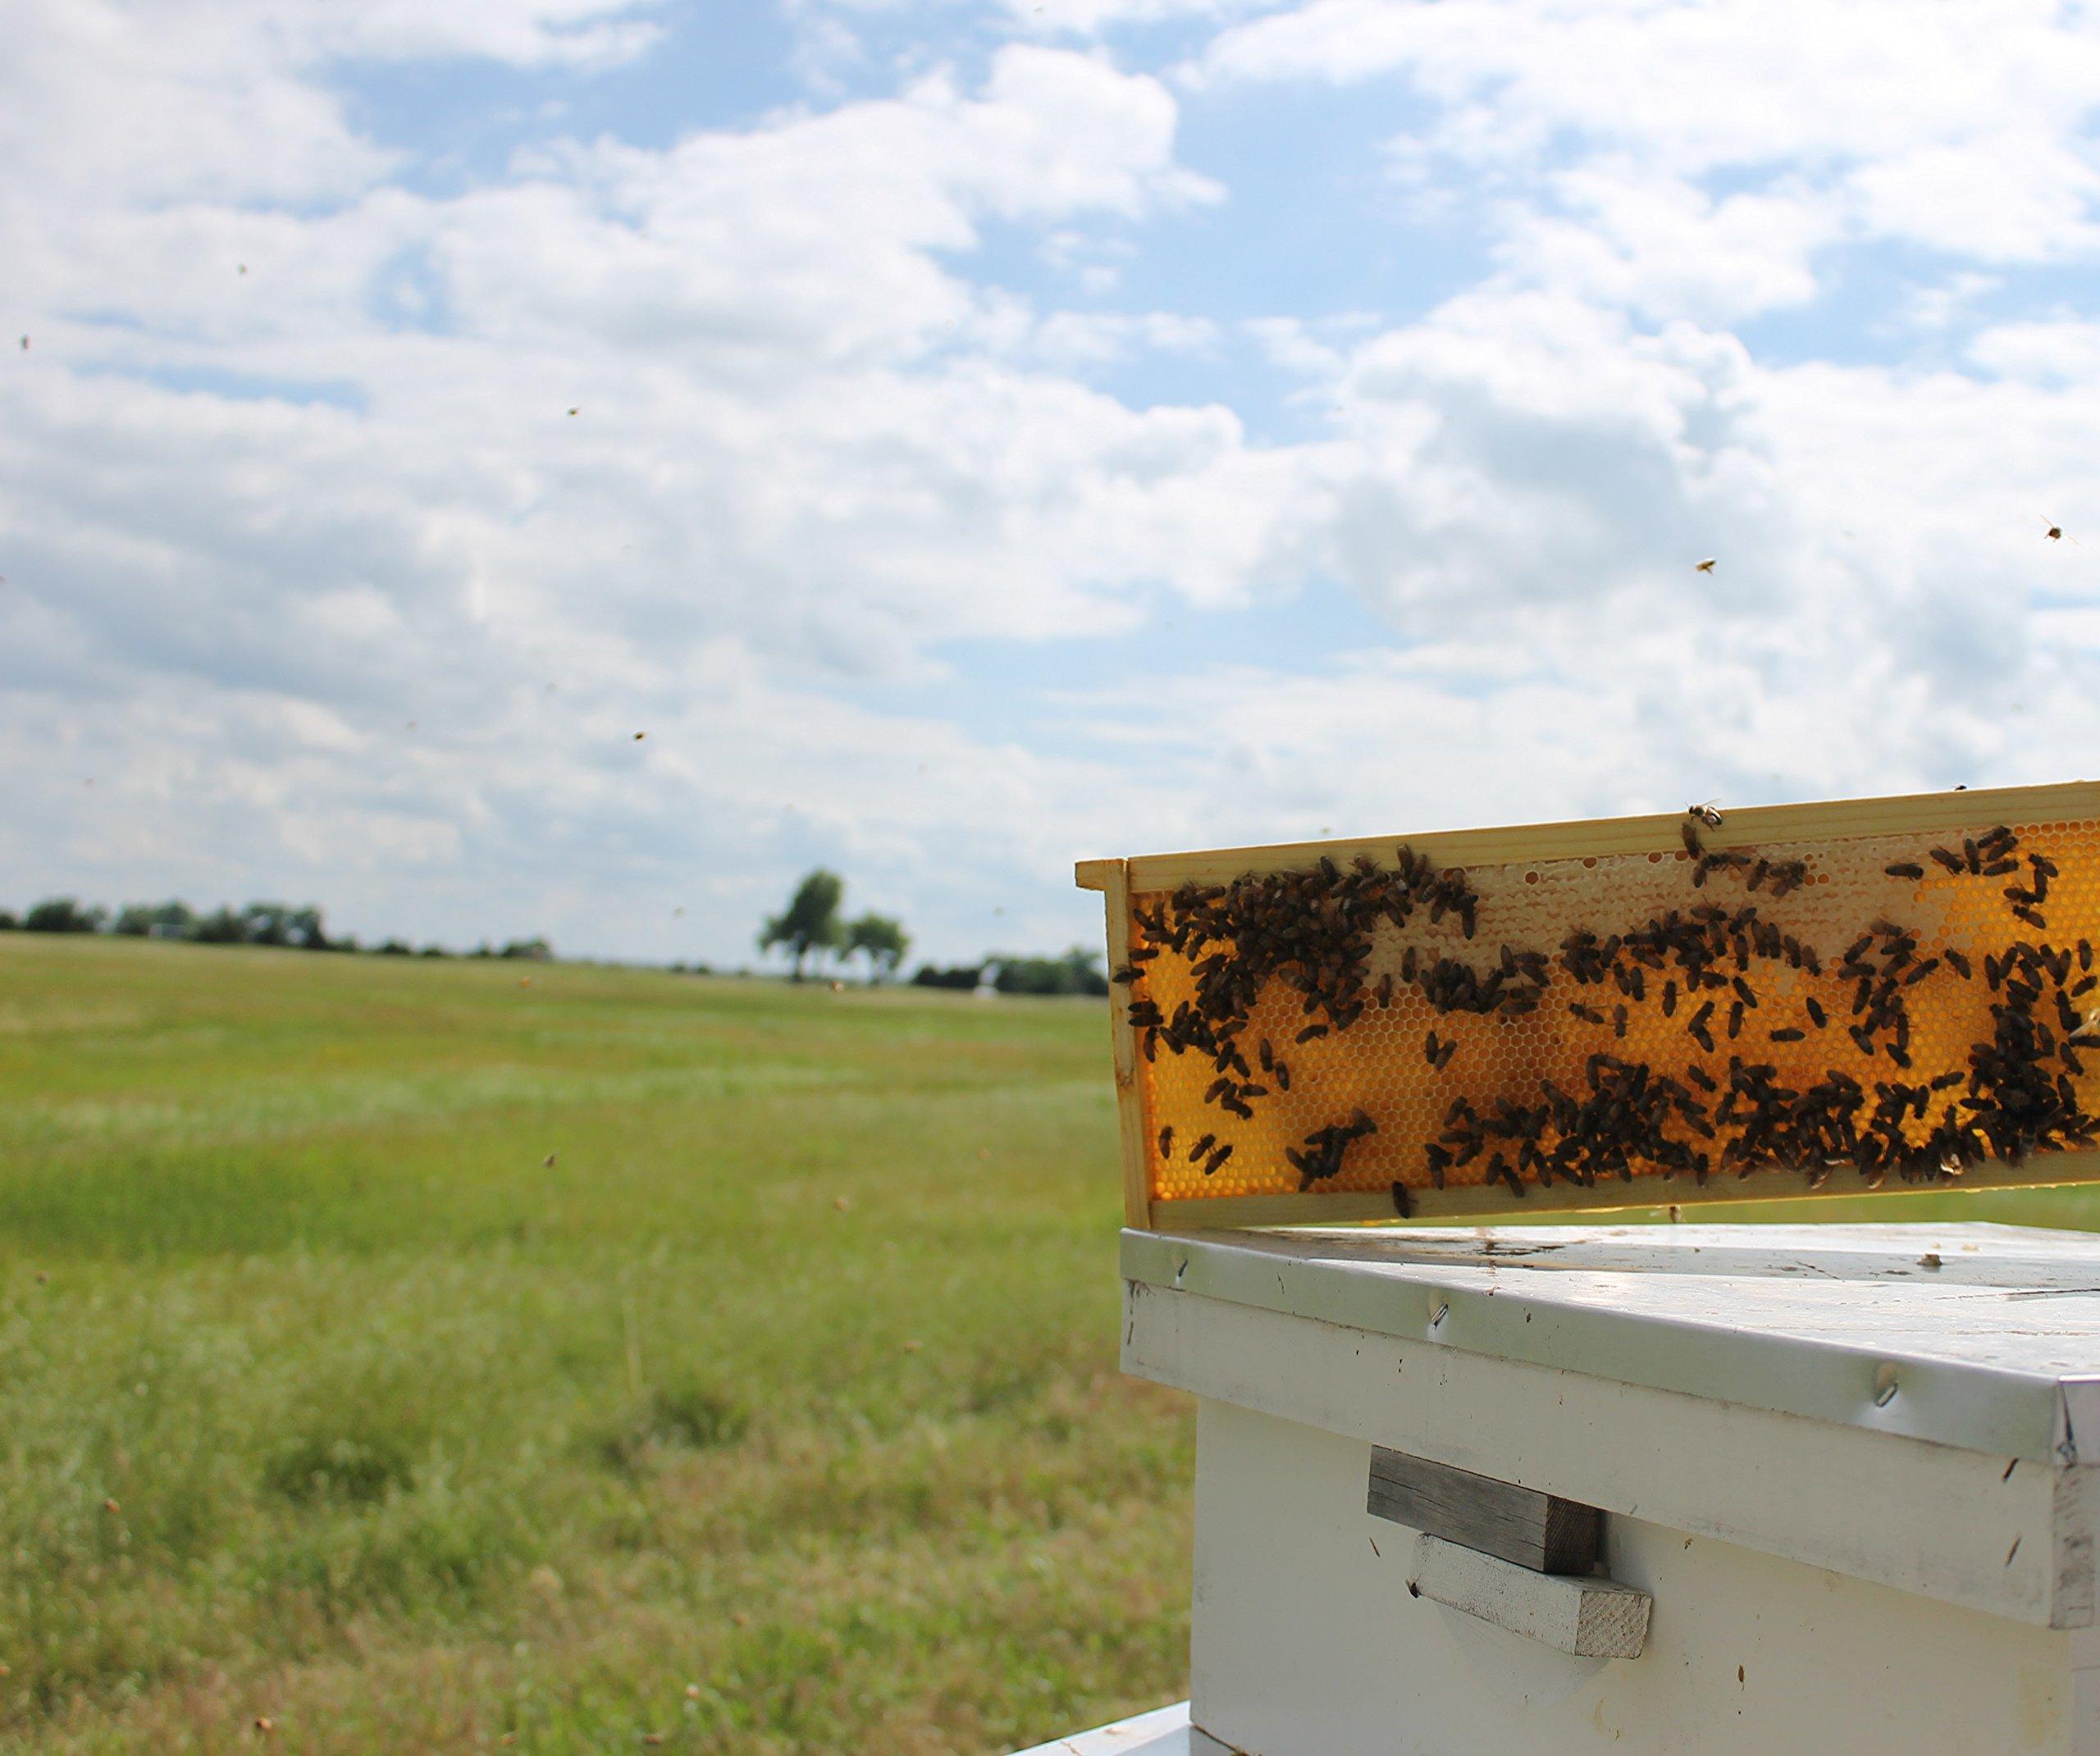 Raw Honey Pure Natural Nebraska Honey One 2lb Jar by Prairie River Honey Farm (Image #5)